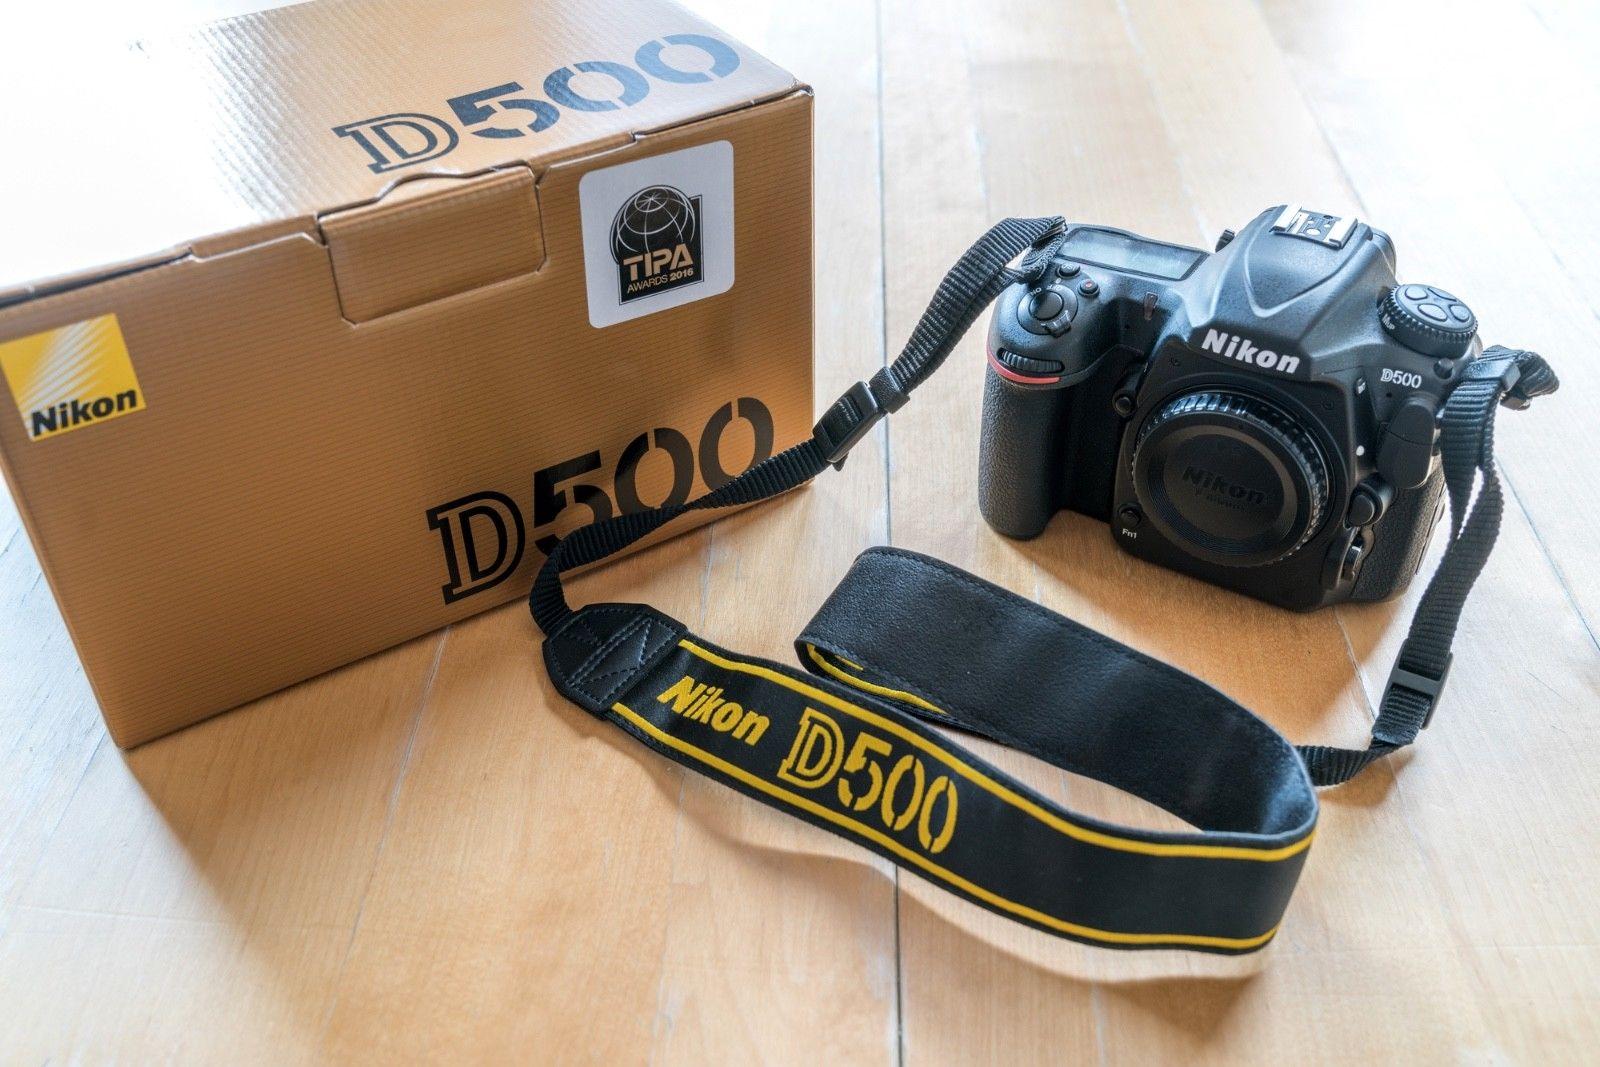 Nikon D D500 20.9MP Digitalkamera - Schwarz (Nur Gehäuse) (100th Anniversary...